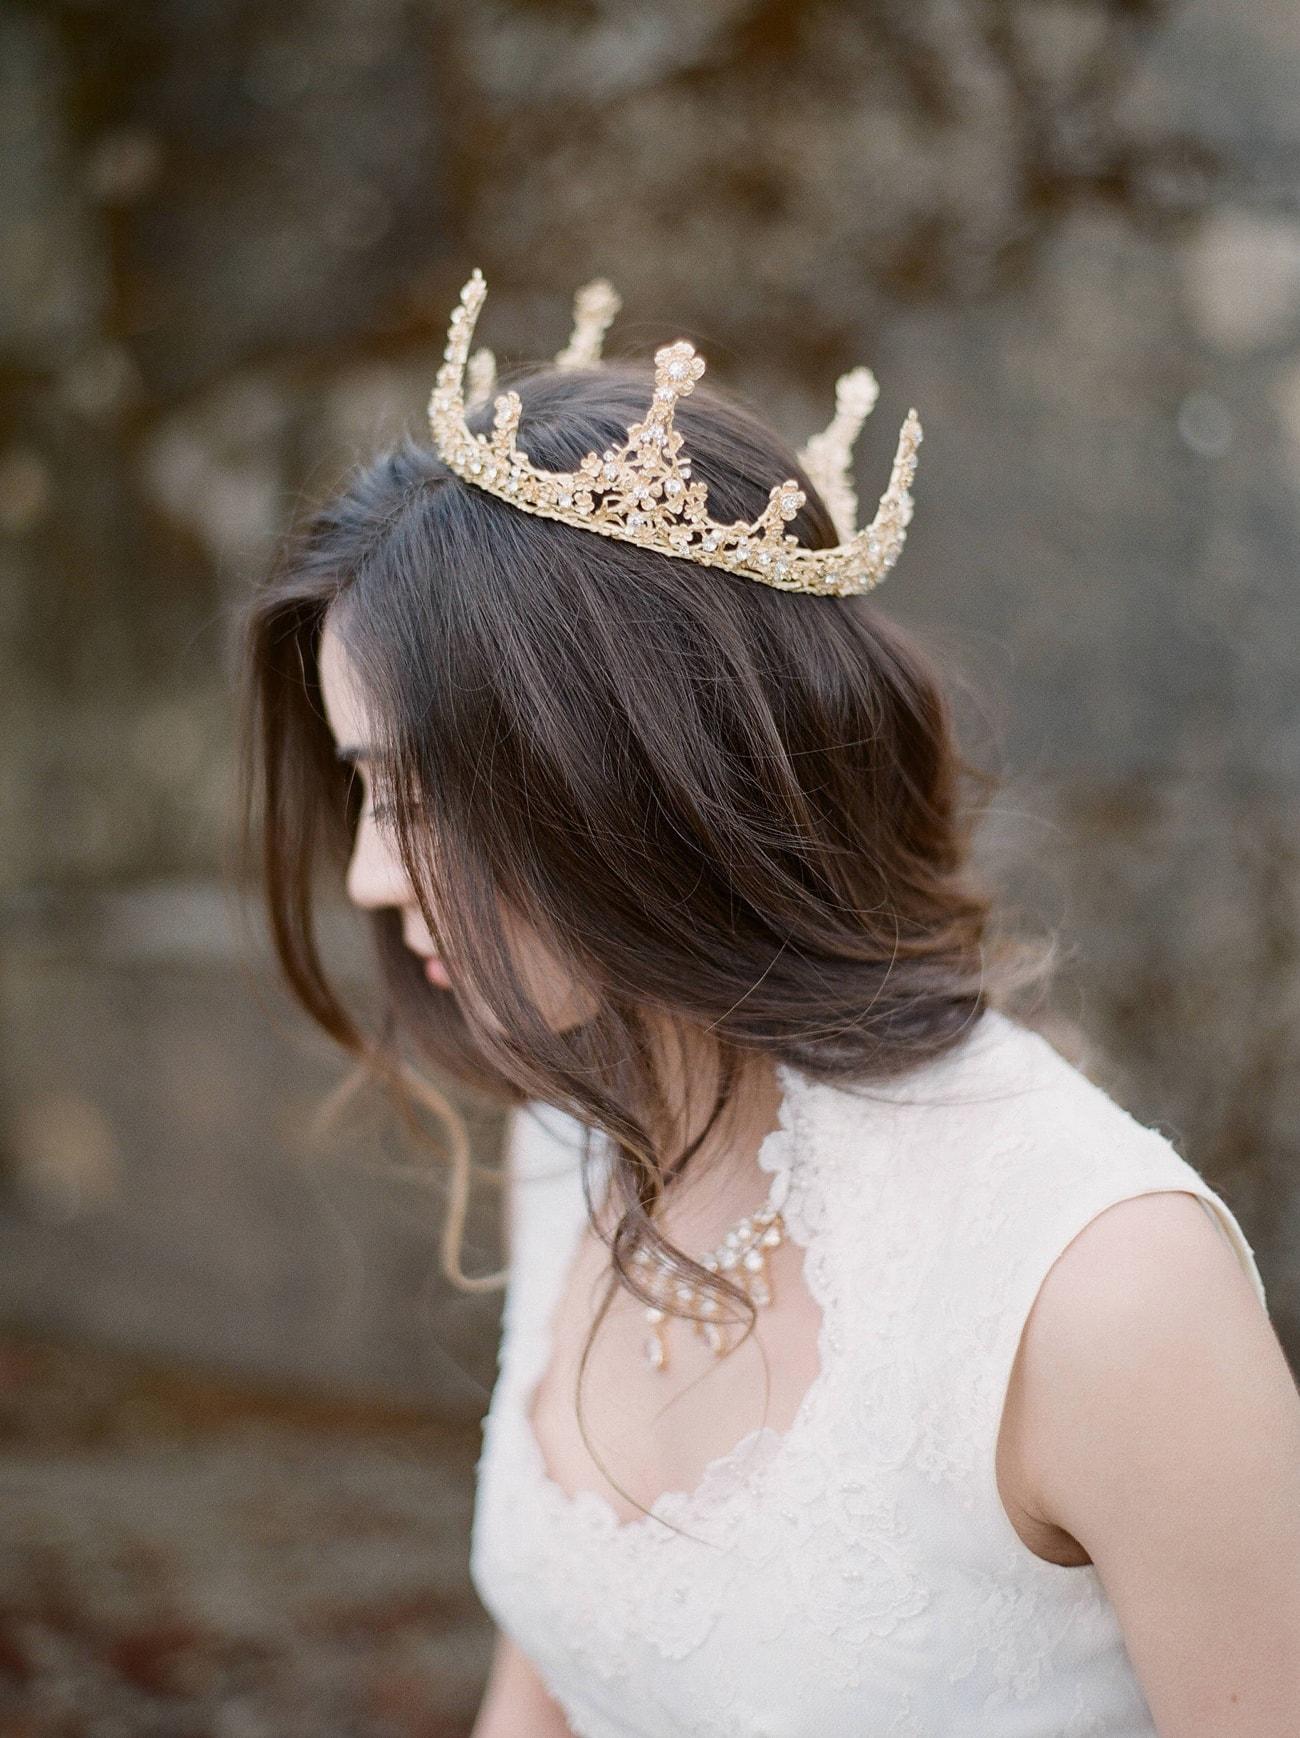 Fairytale bridal crowns tiaras from eden luxe bridal southbound alexa bronze wedding crown left chantal swarovski bridal tiara right junglespirit Images